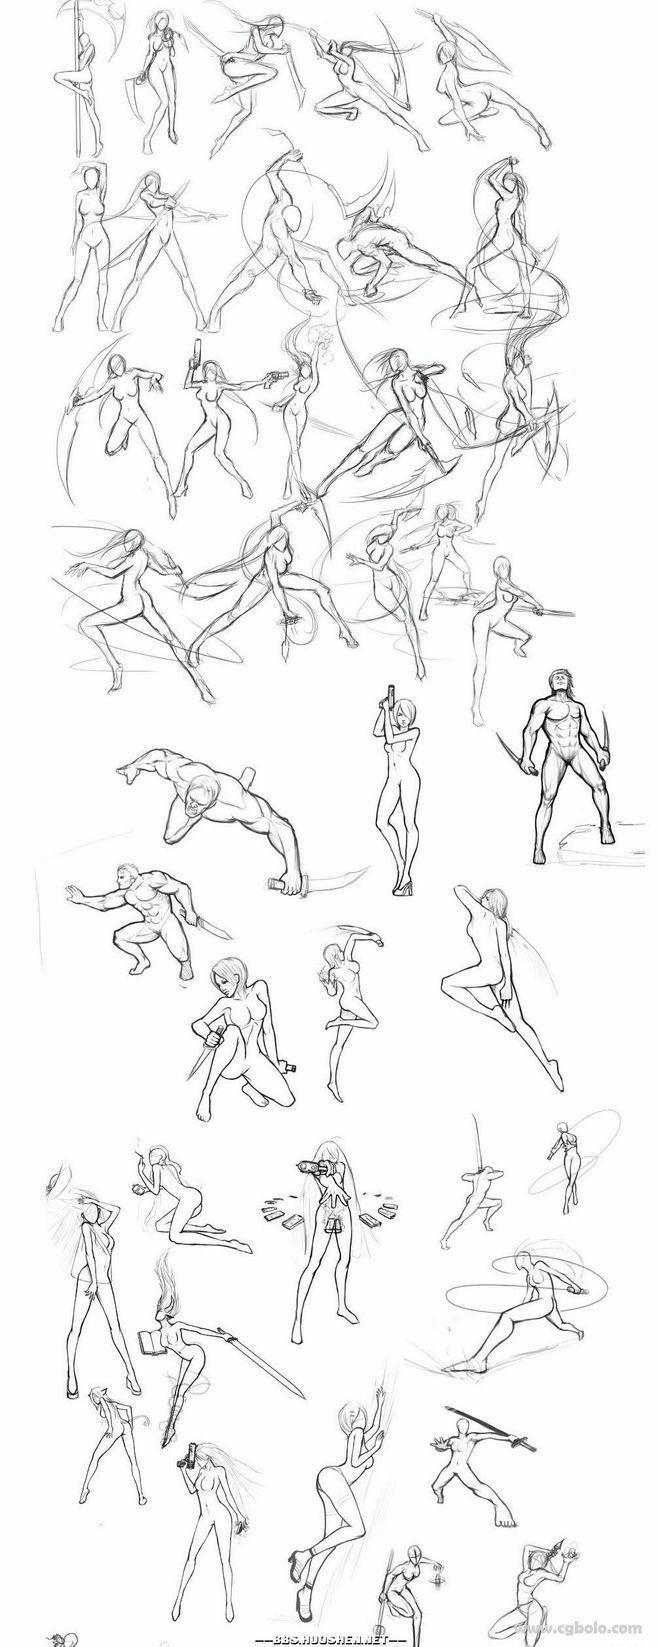 Pin de Freddy Villeda Madrid en How to Draw   Pinterest   Bocetos ...